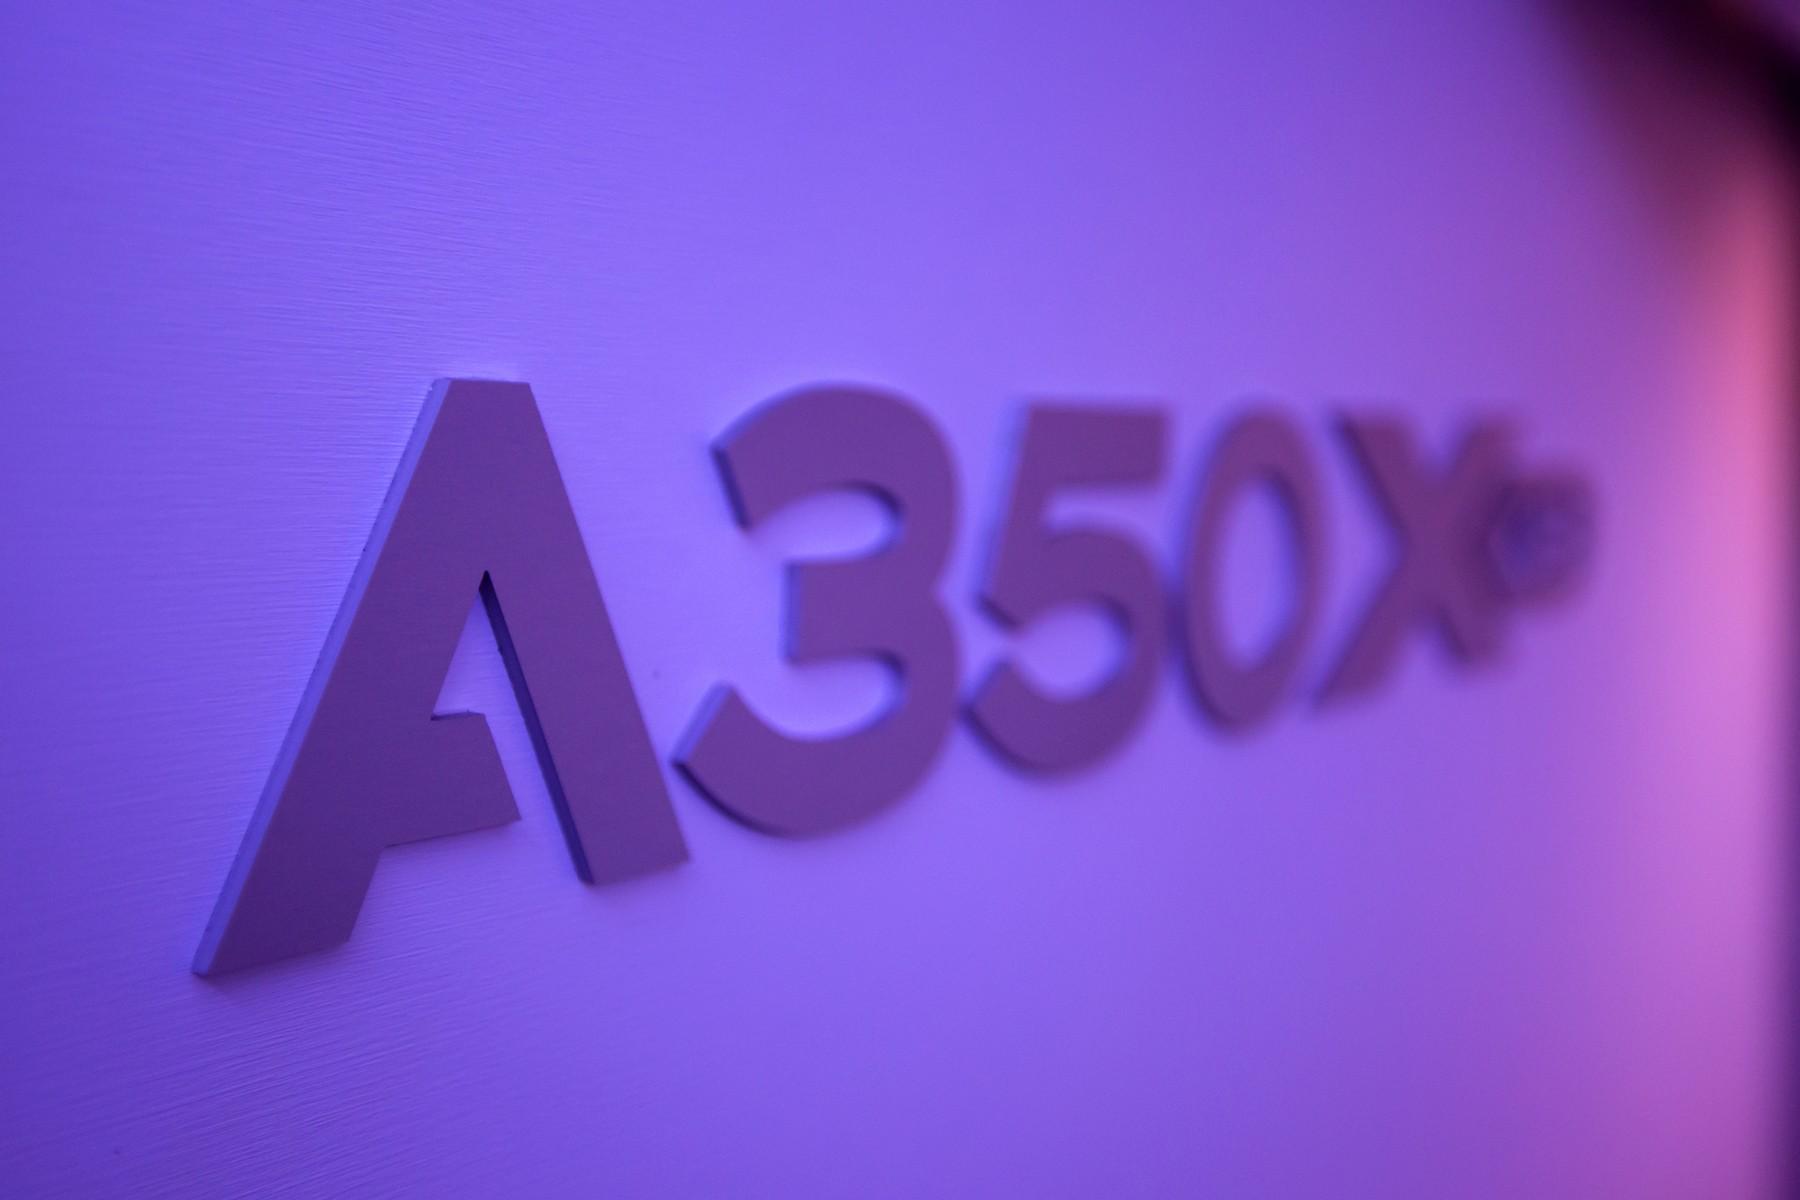 Re:[原创]A350XWB环球路演北京站 @ Ameco Beijing AIRBUS A350-941 F-WWCF 中国北京首都国际机场